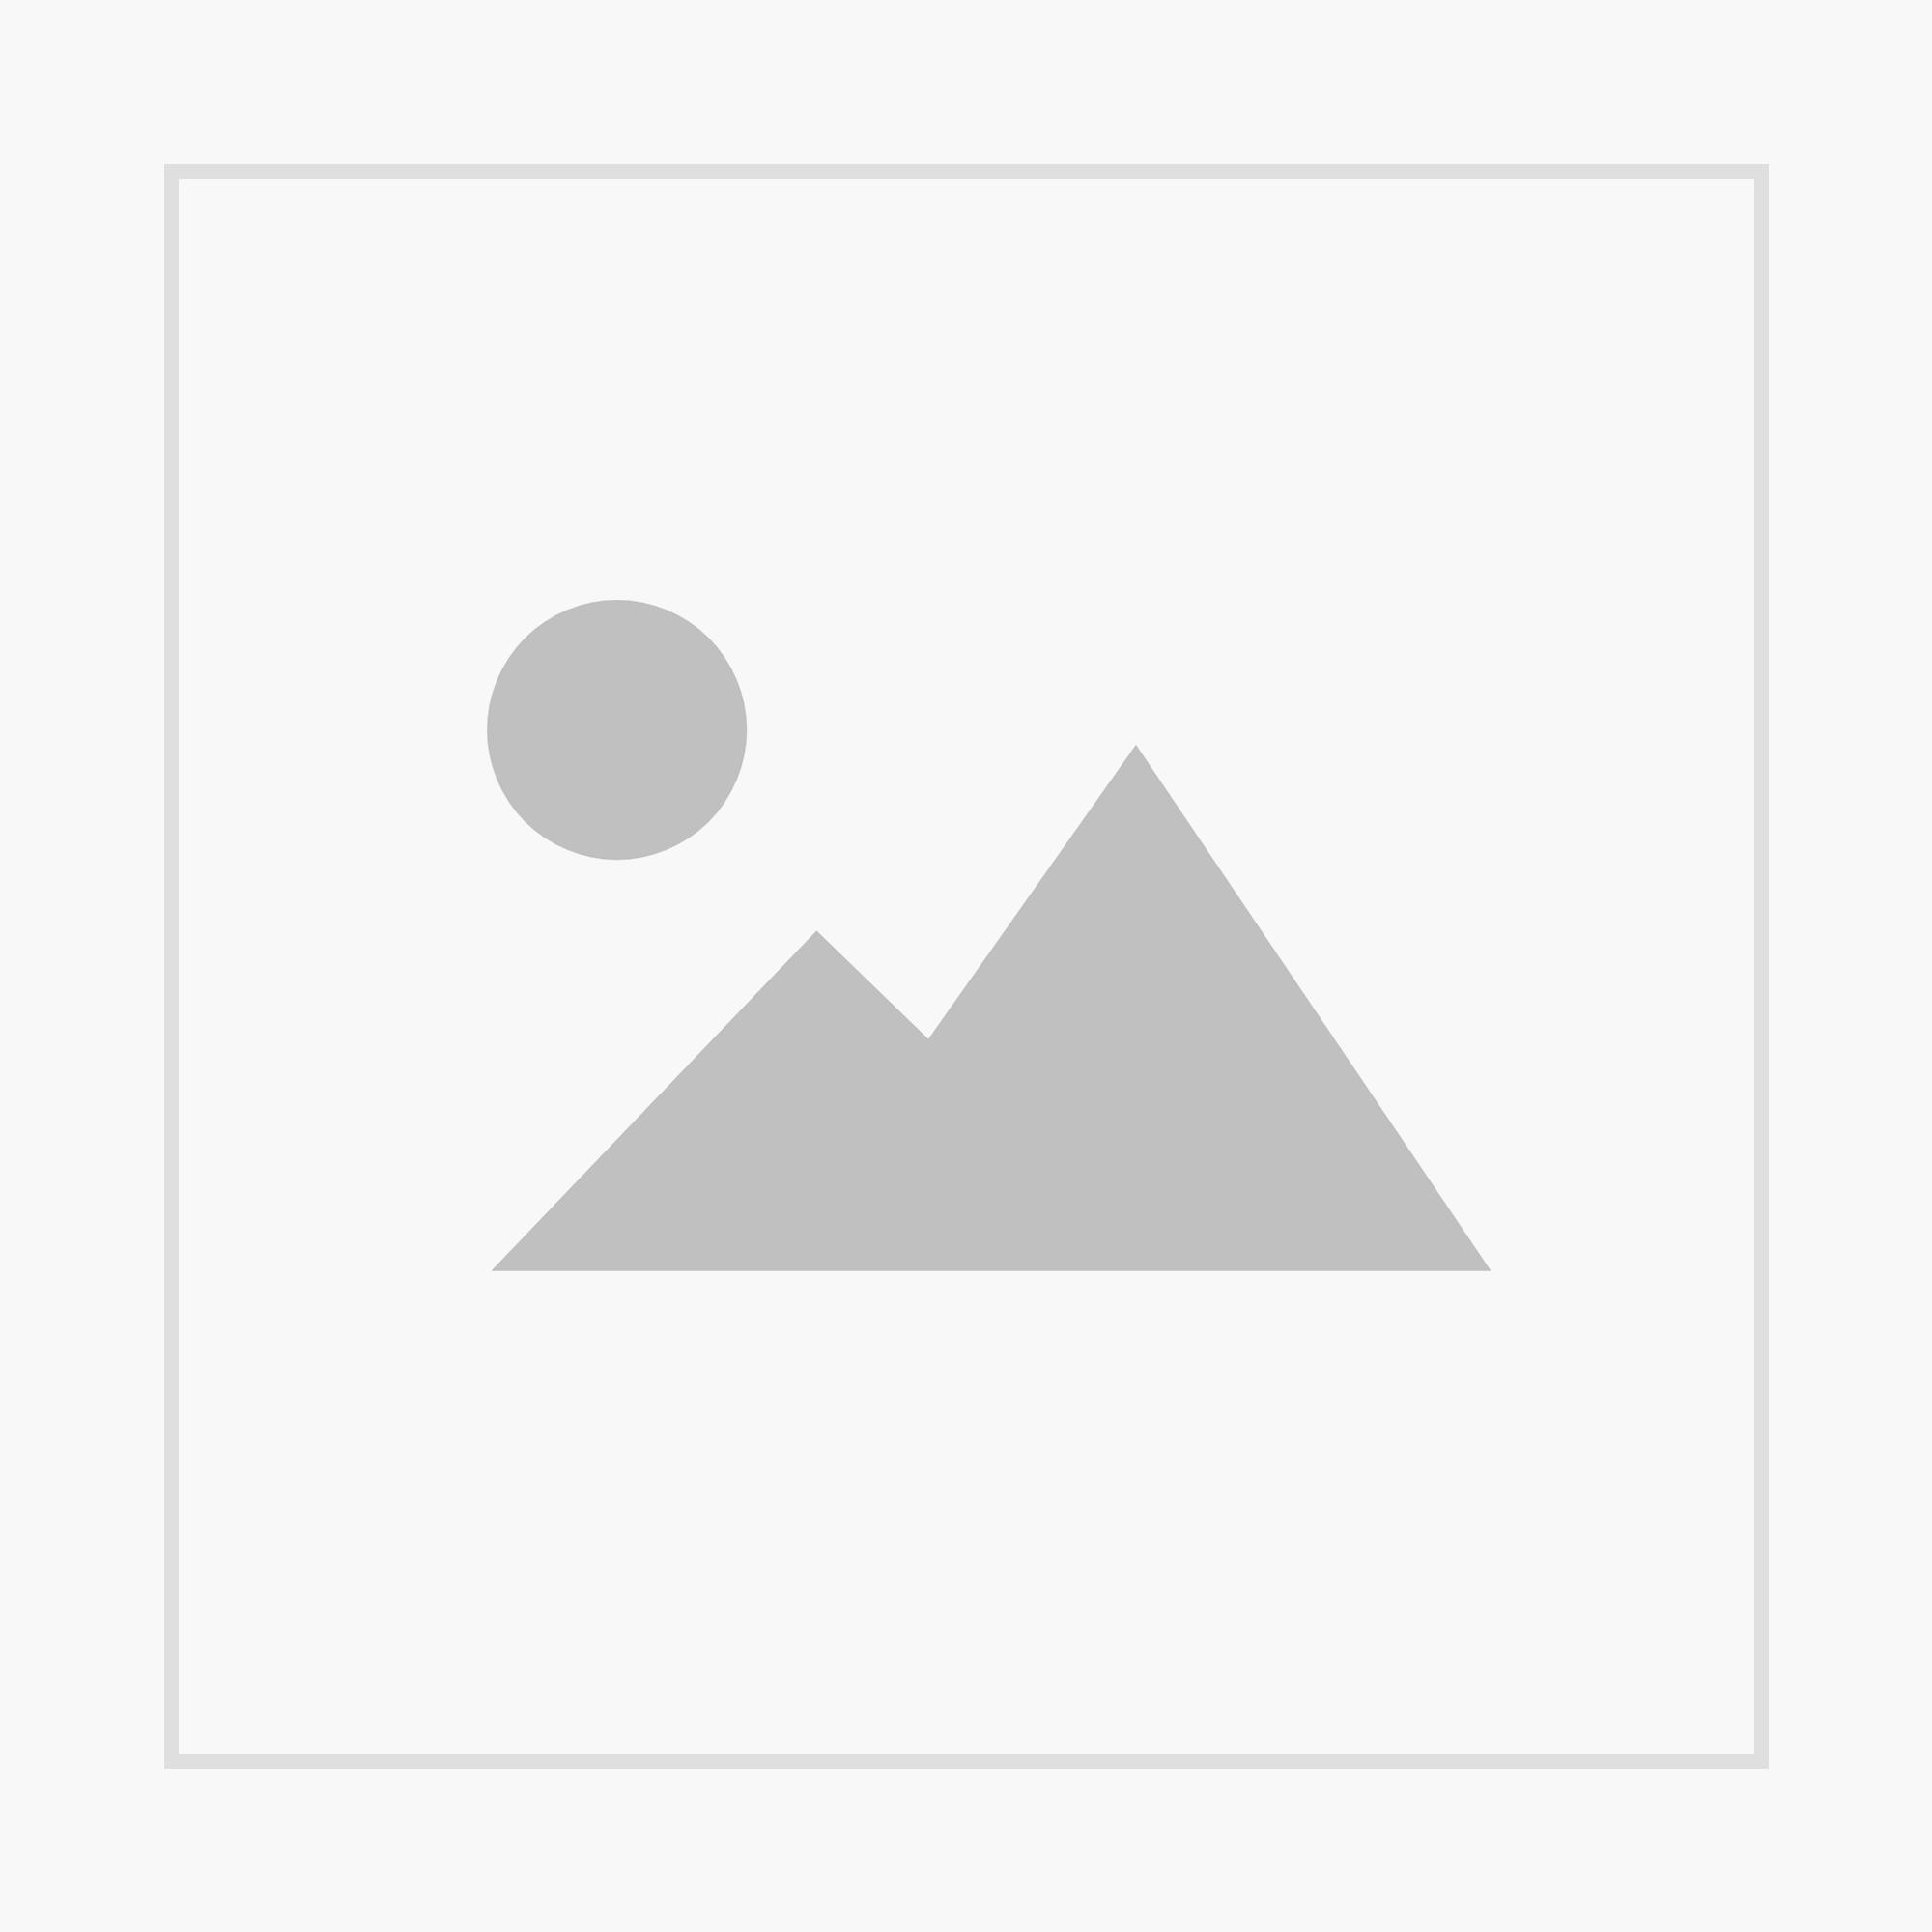 Landlust - Sommerseide Graublau Meliert